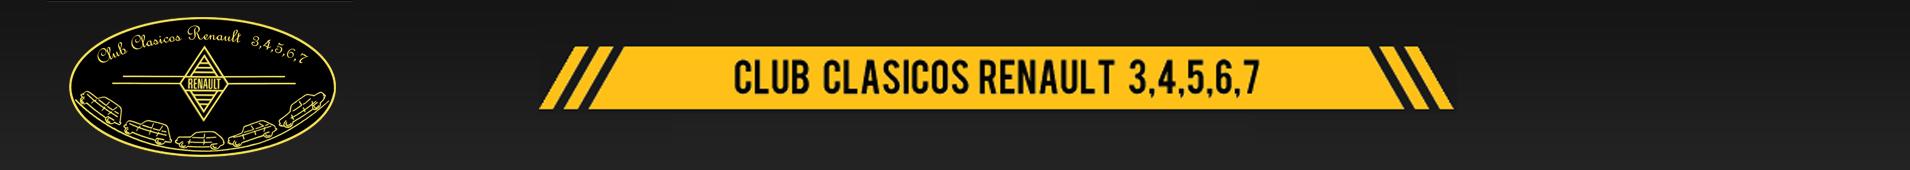 CLUB CLASICOS 3,4,5,6 Y 7 RENAULT